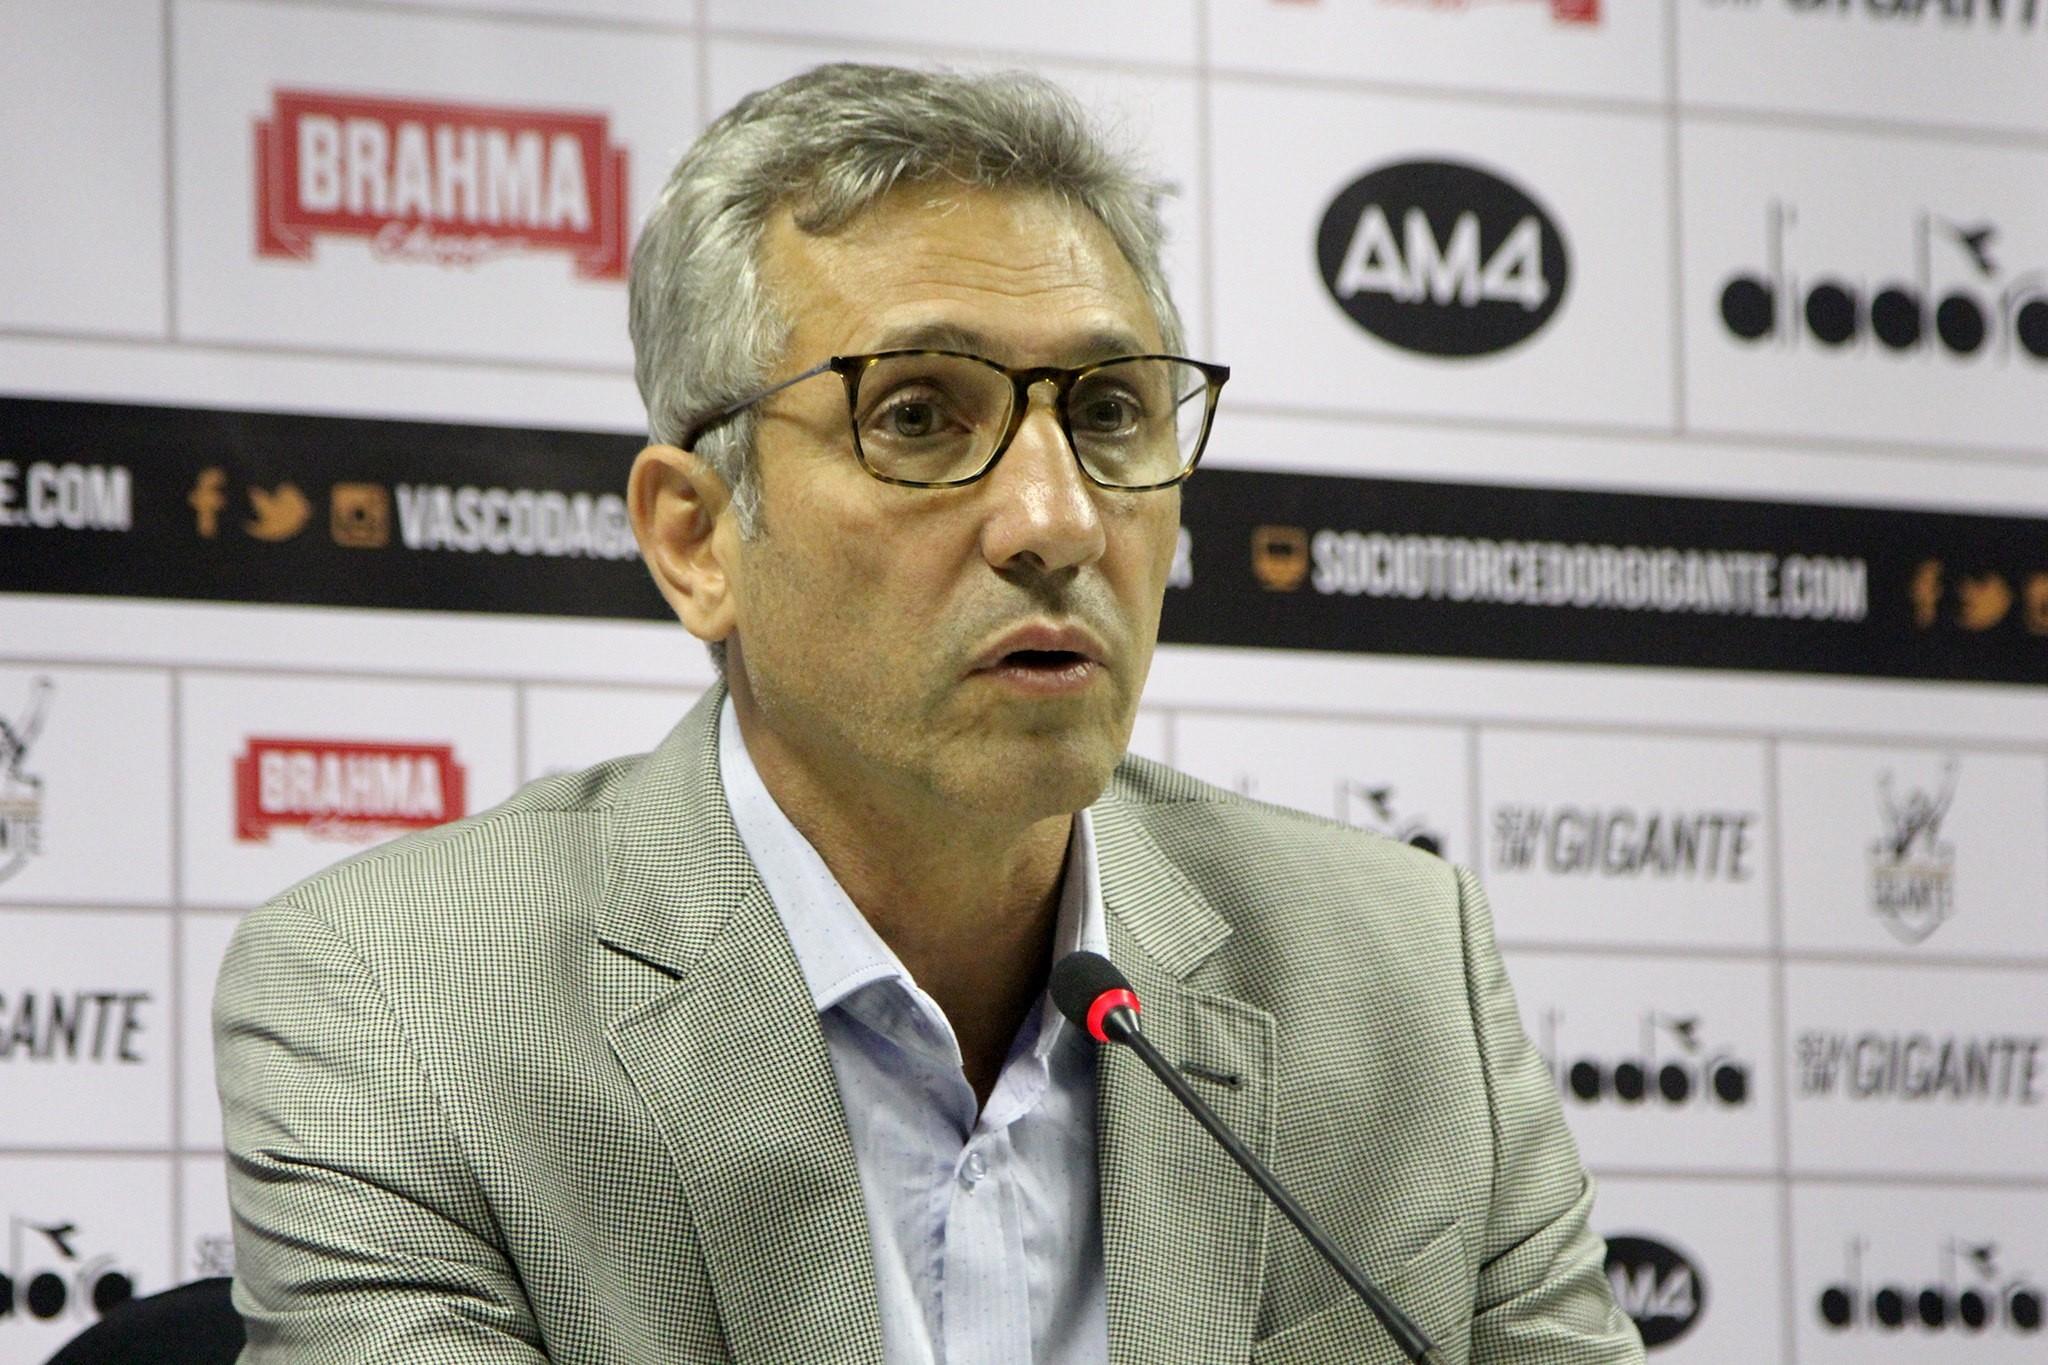 Presidente Alexandre Campello alegou má-fé na assinatura do termo